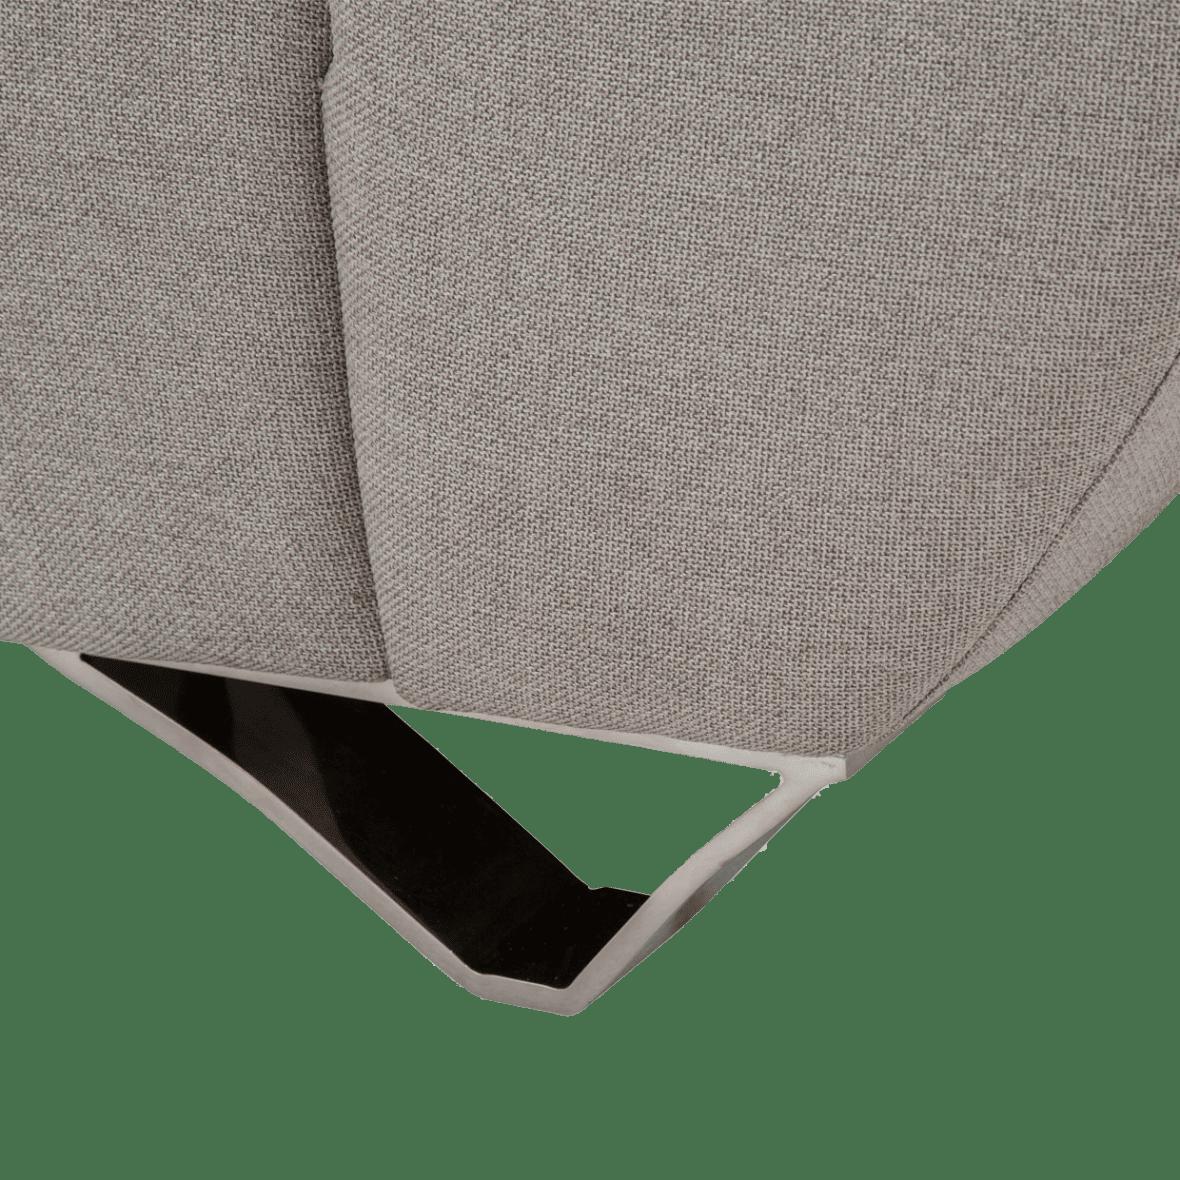 Quantum Софа Lovaseat, Stainless Steel